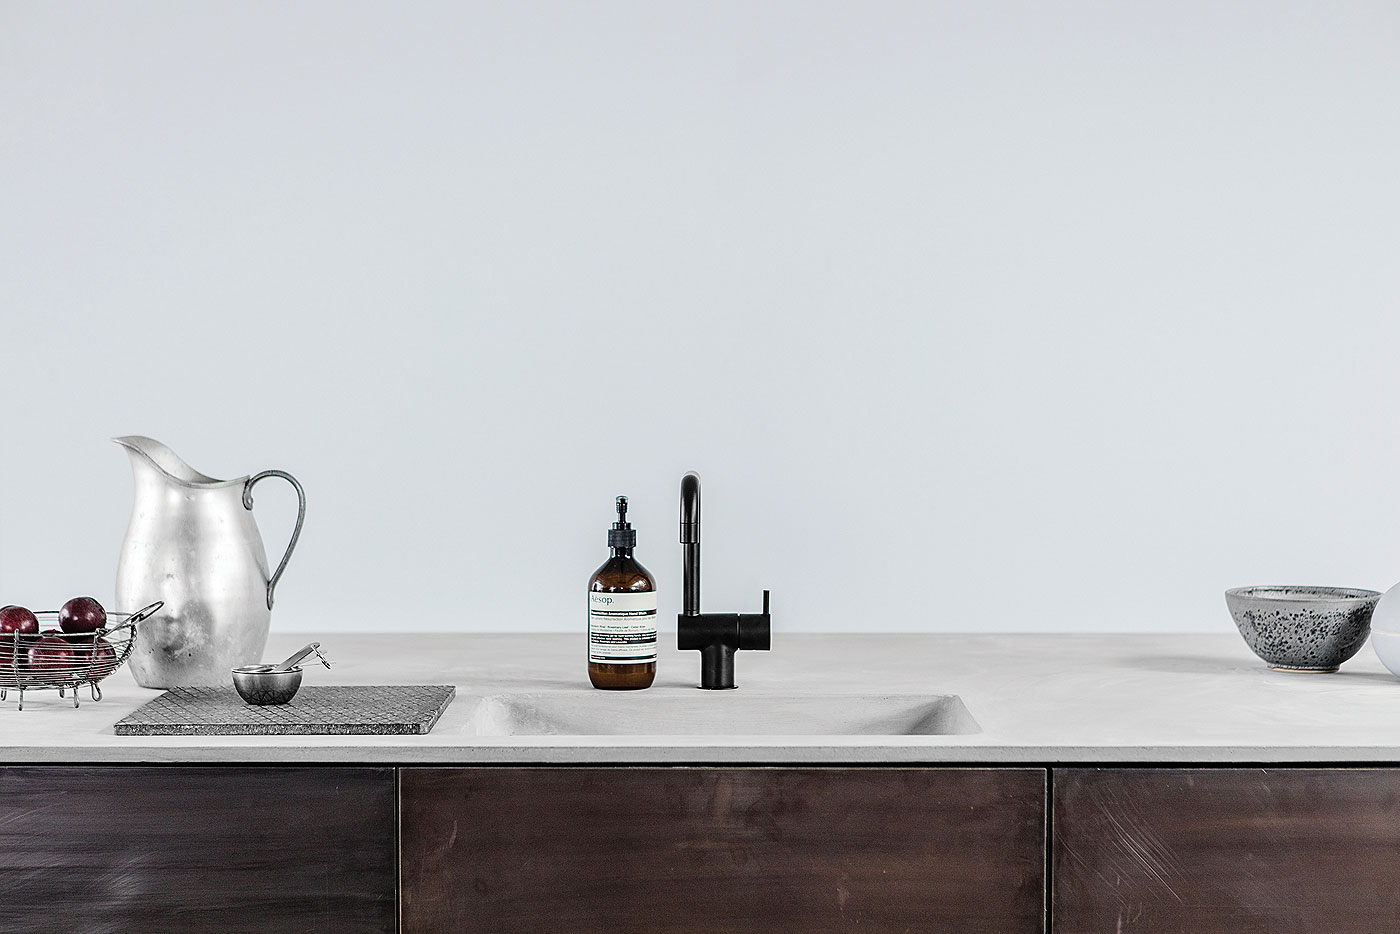 cocina-reform-norm-architects (2)